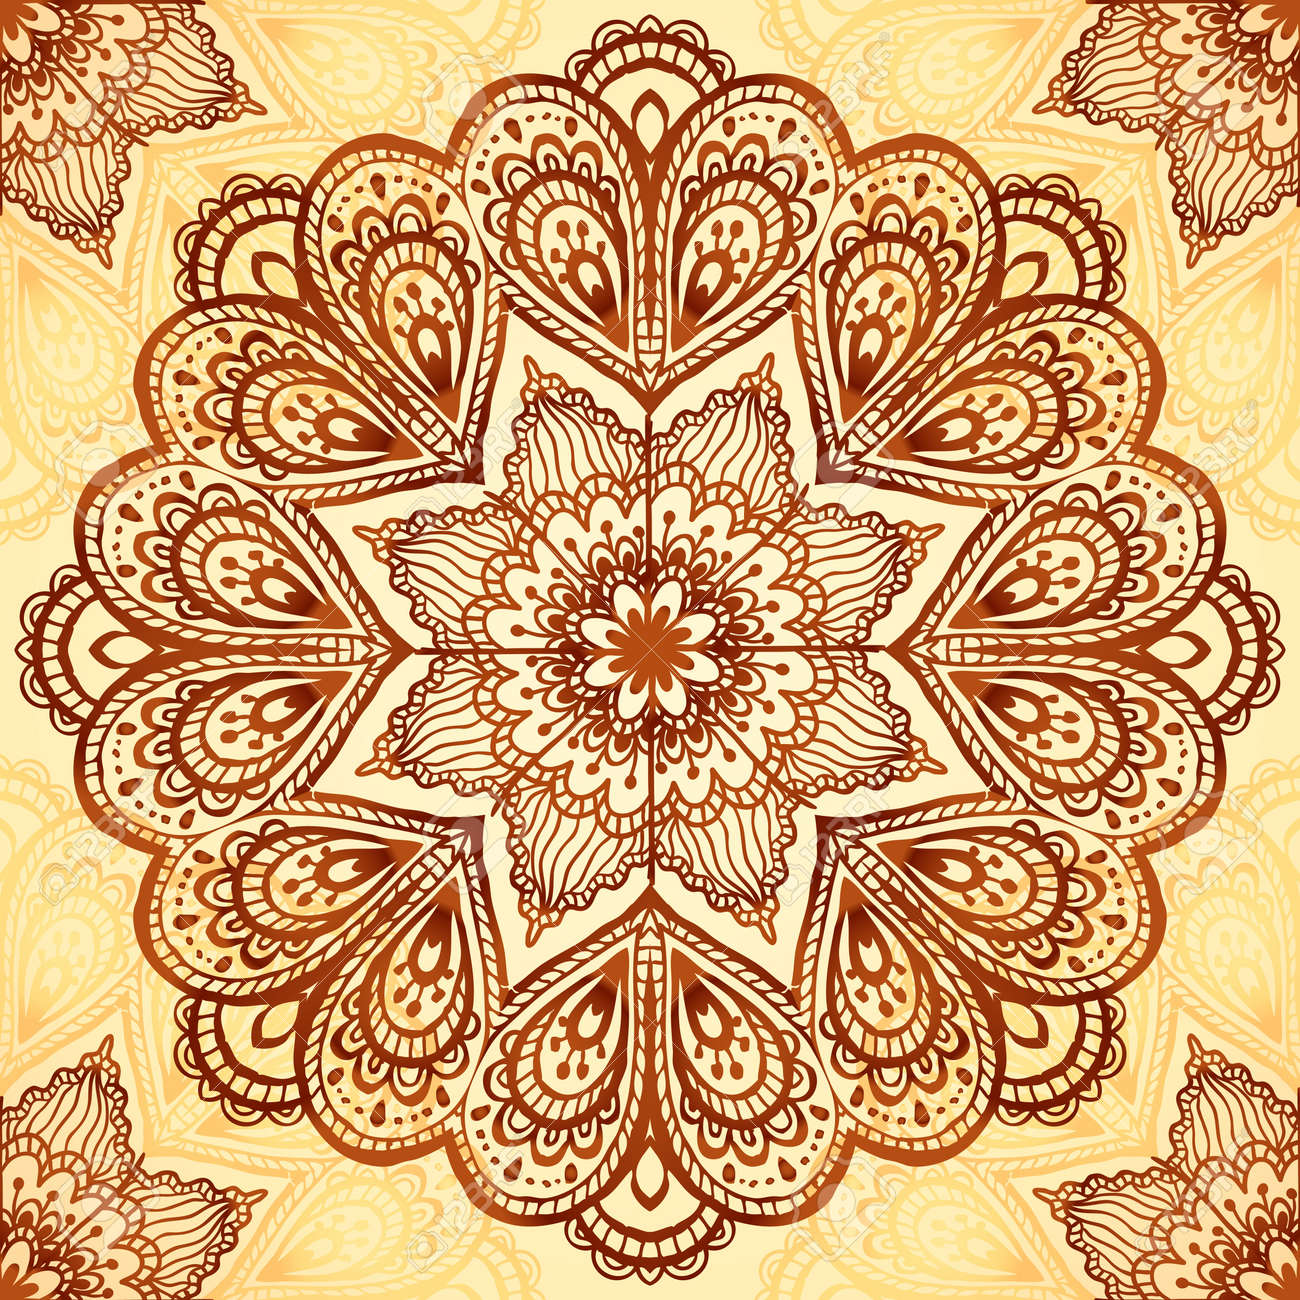 Ornate vintage vector background in mehndi style royalty free stock - Ornate Vintage Vector Napkin Background Stock Vector 20141824